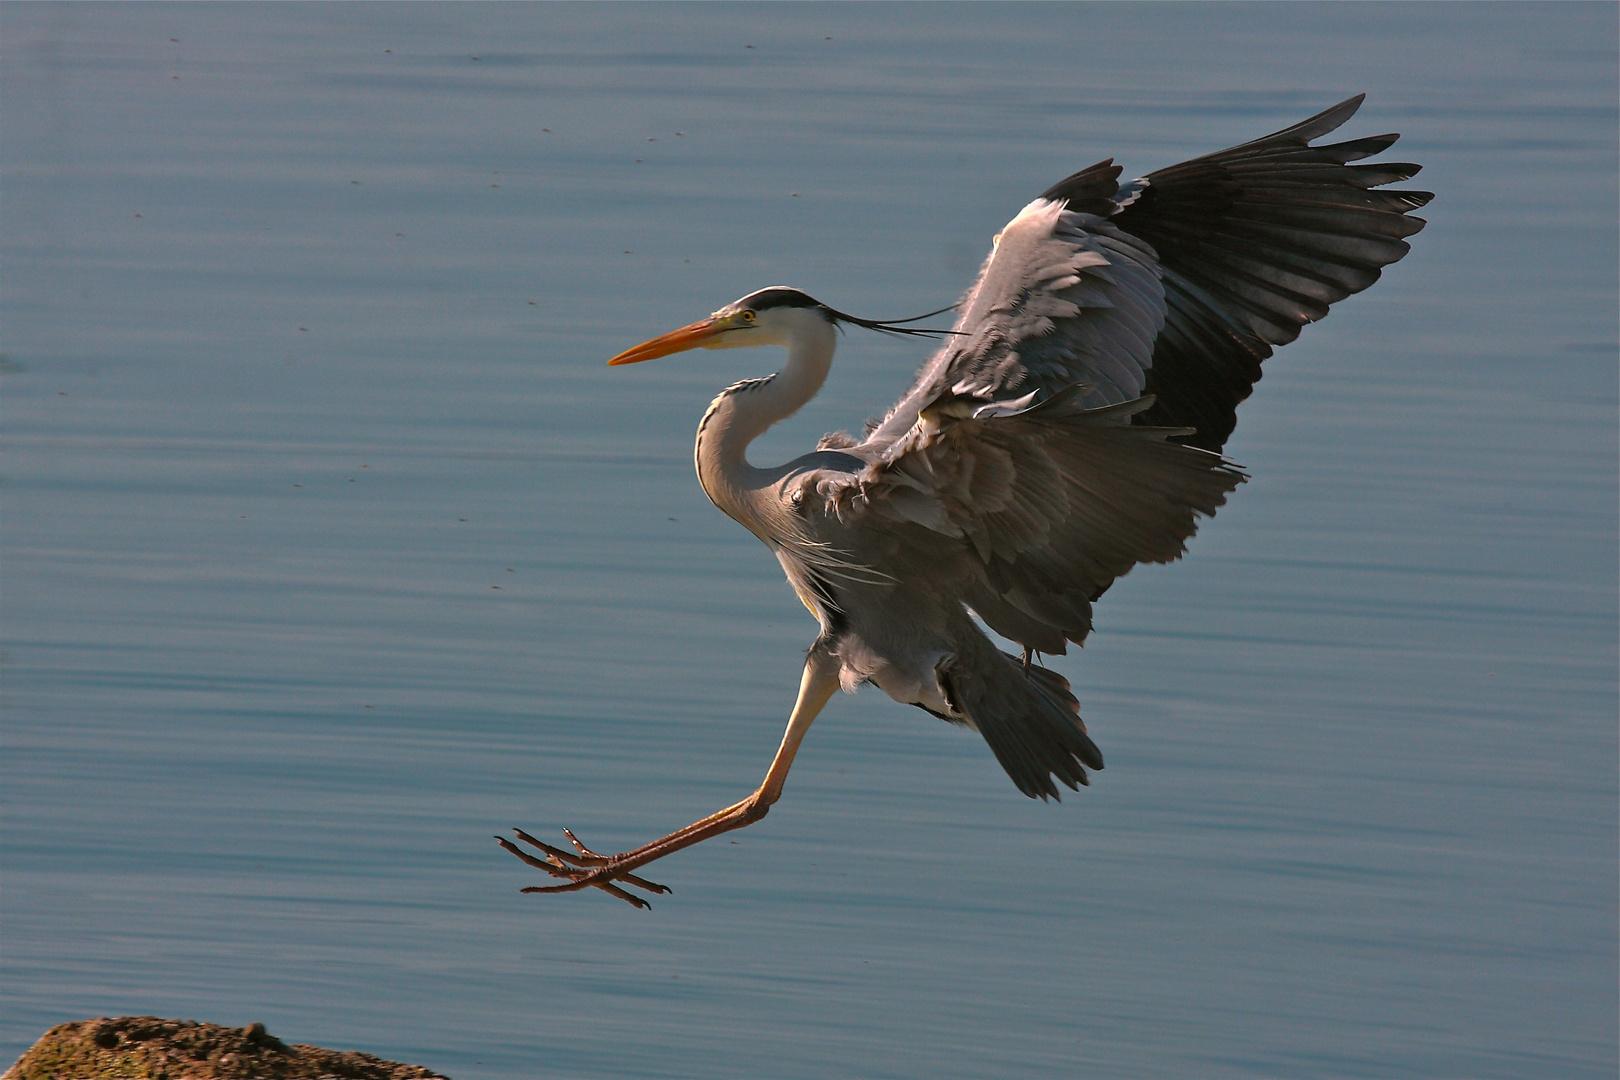 Short landing.